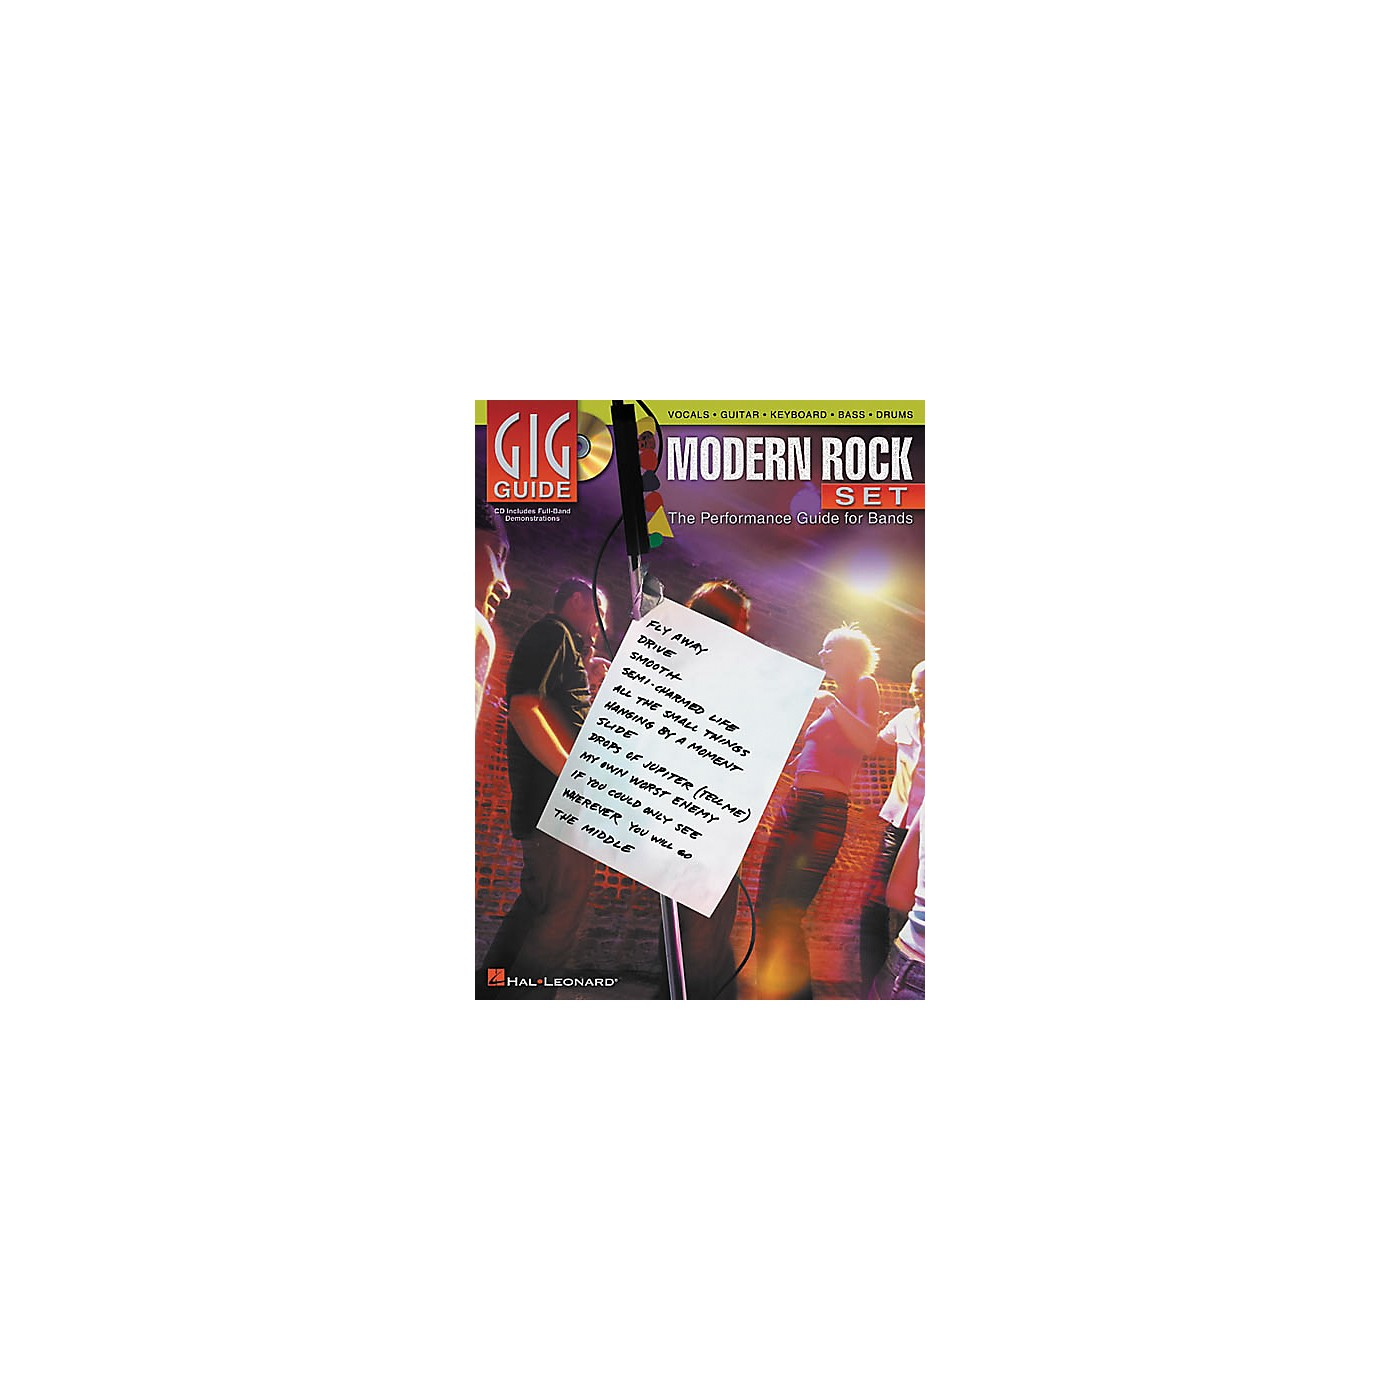 Hal Leonard Modern Rock Set Gig Guide (Book/CD) thumbnail